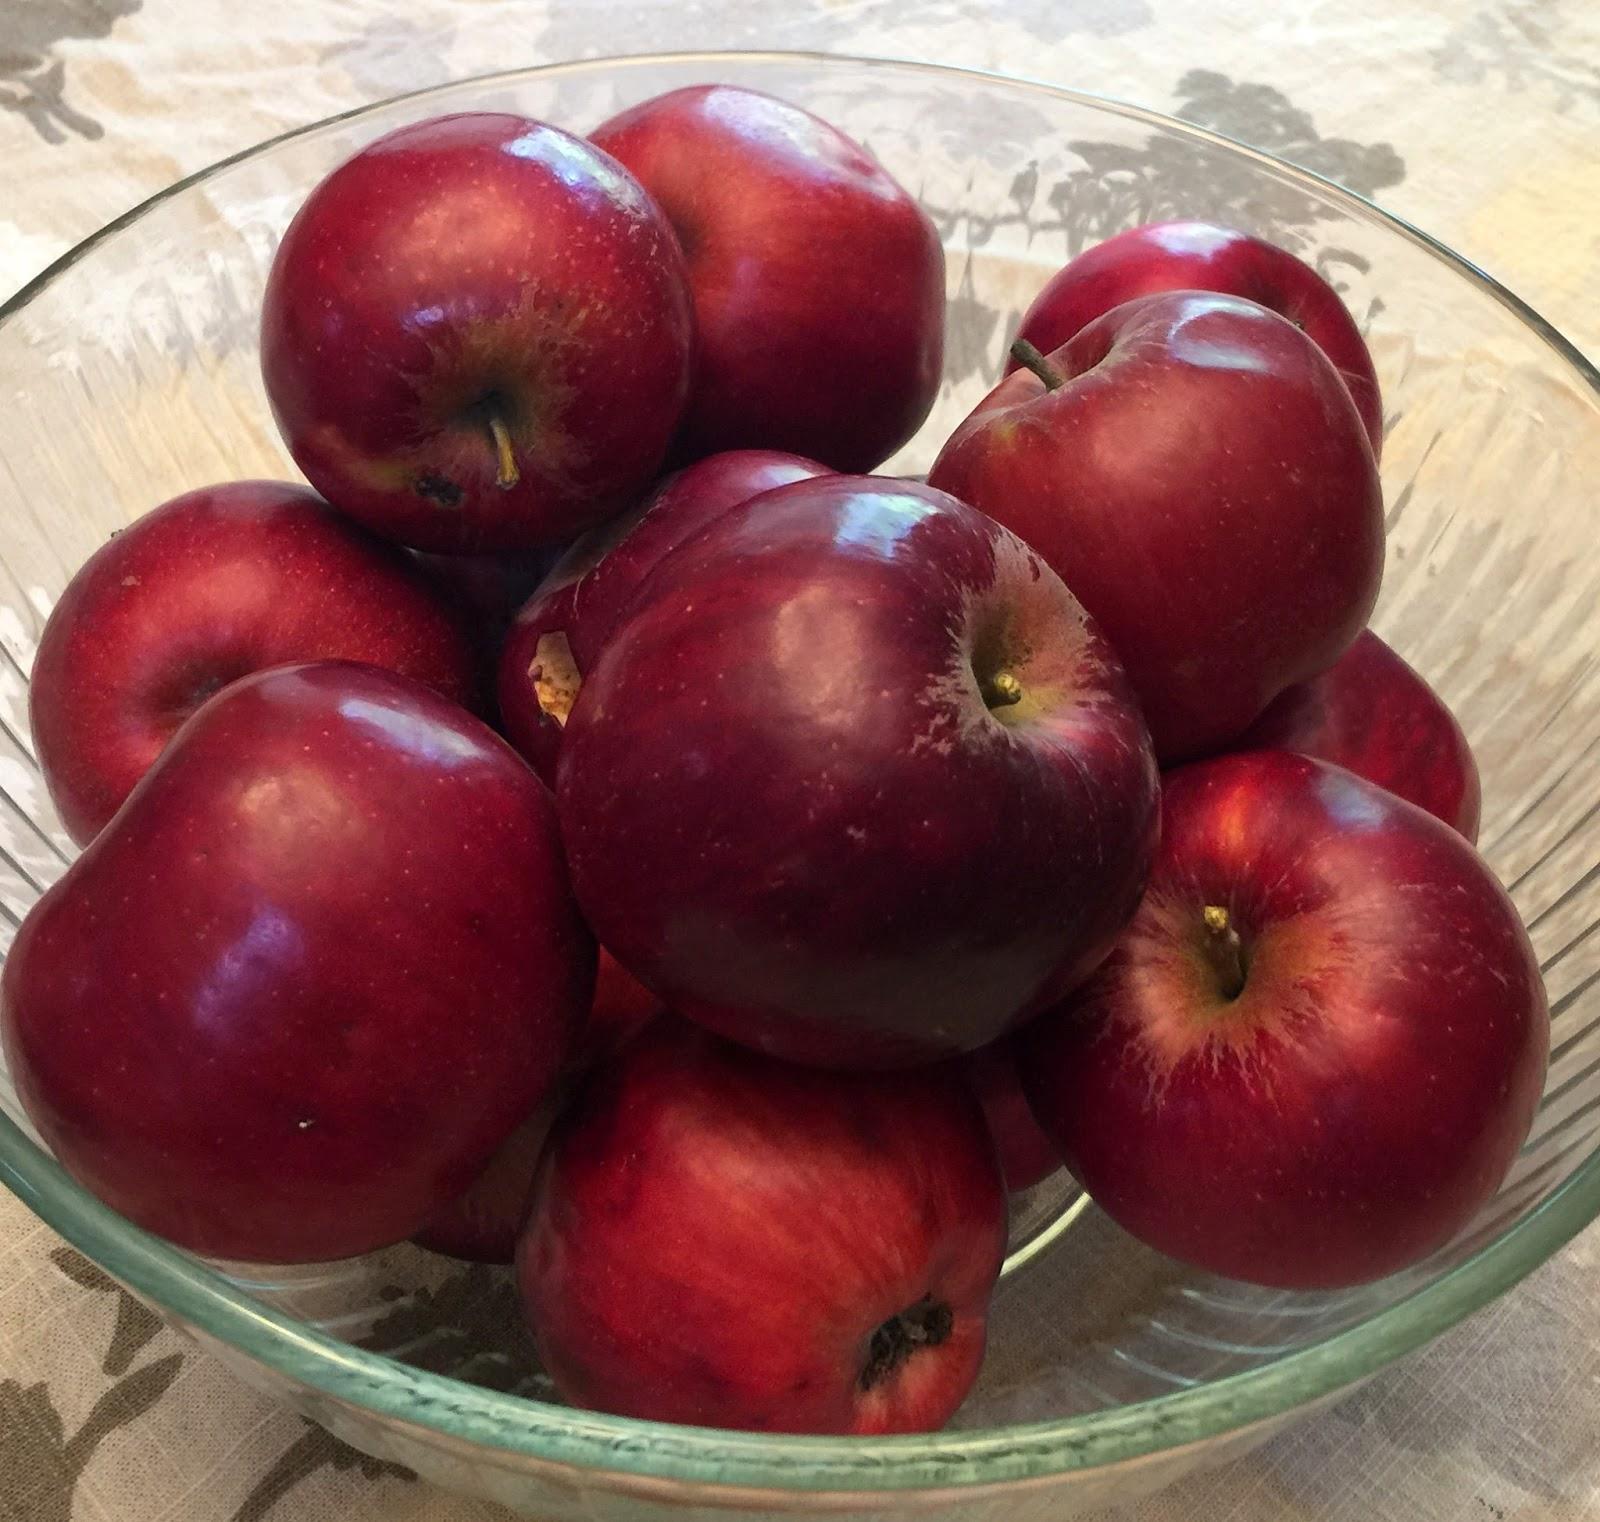 картинки сорта яблок джонатан трети